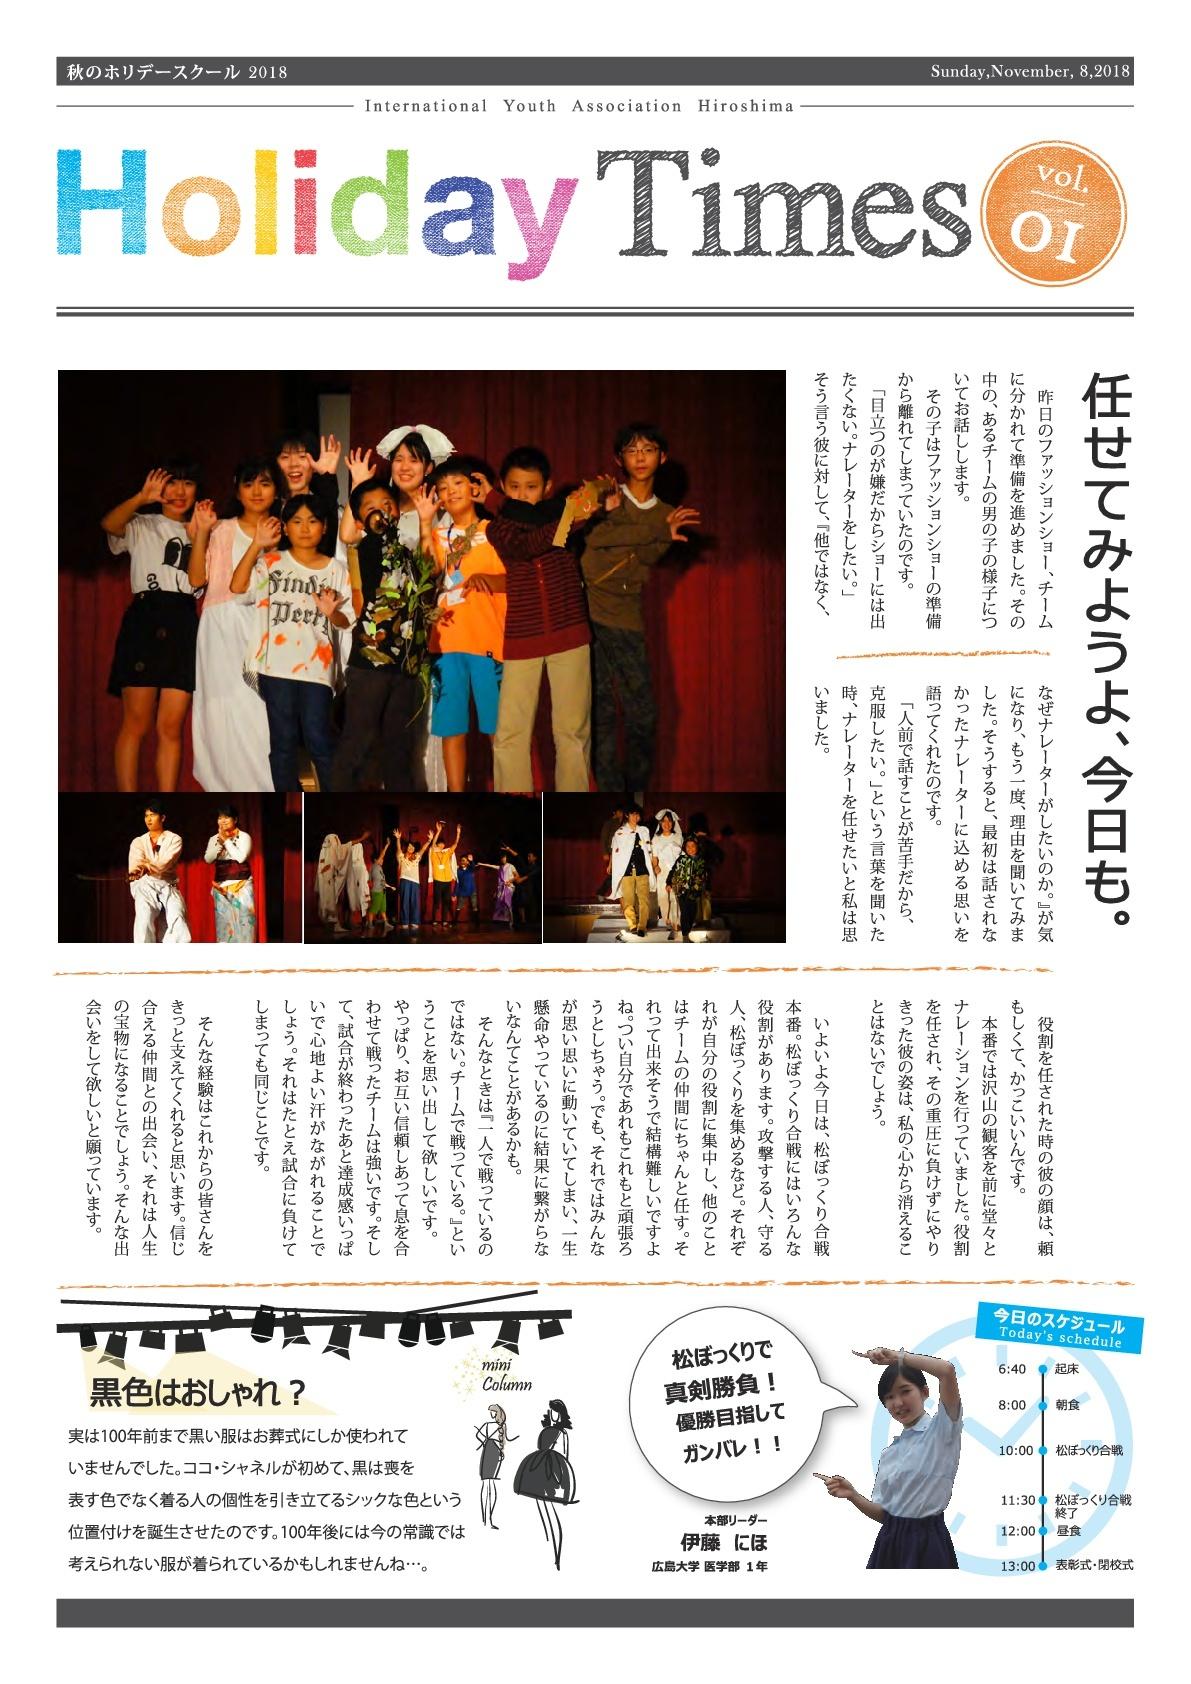 ilovepdf_com.jpg